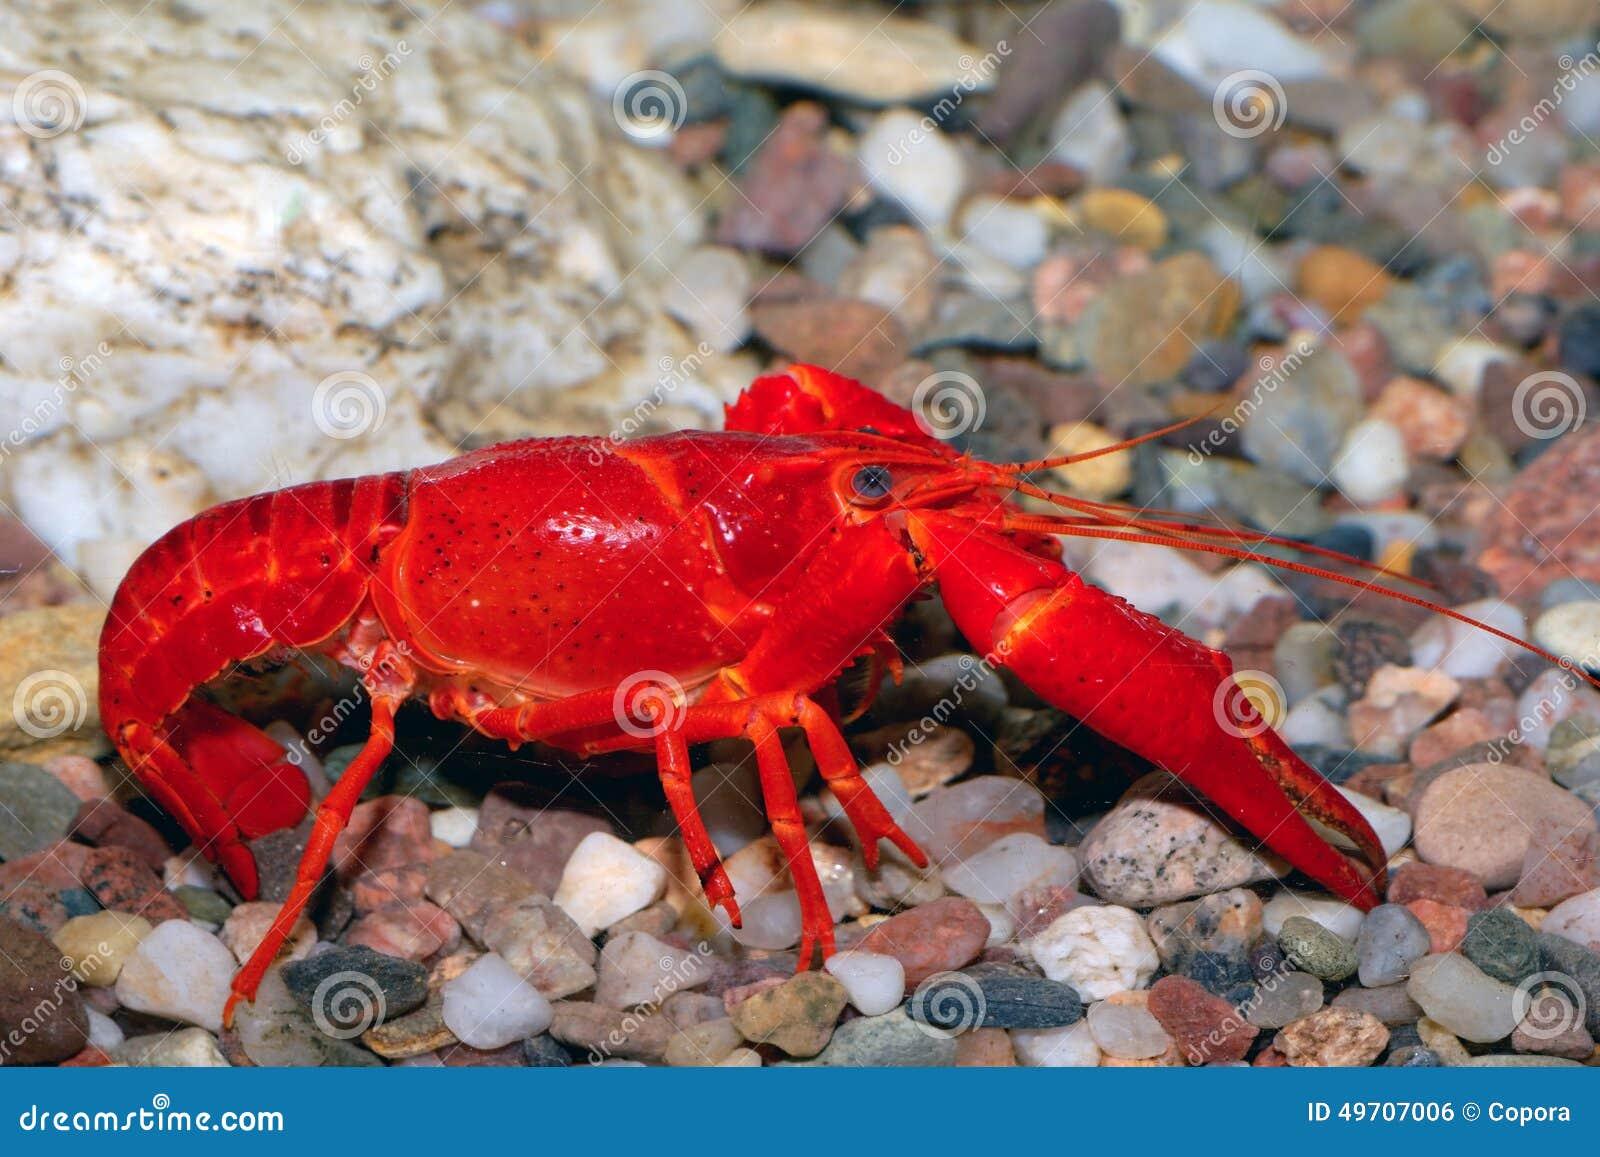 Red crayfish stock photo. Image of crayfish, claw ...